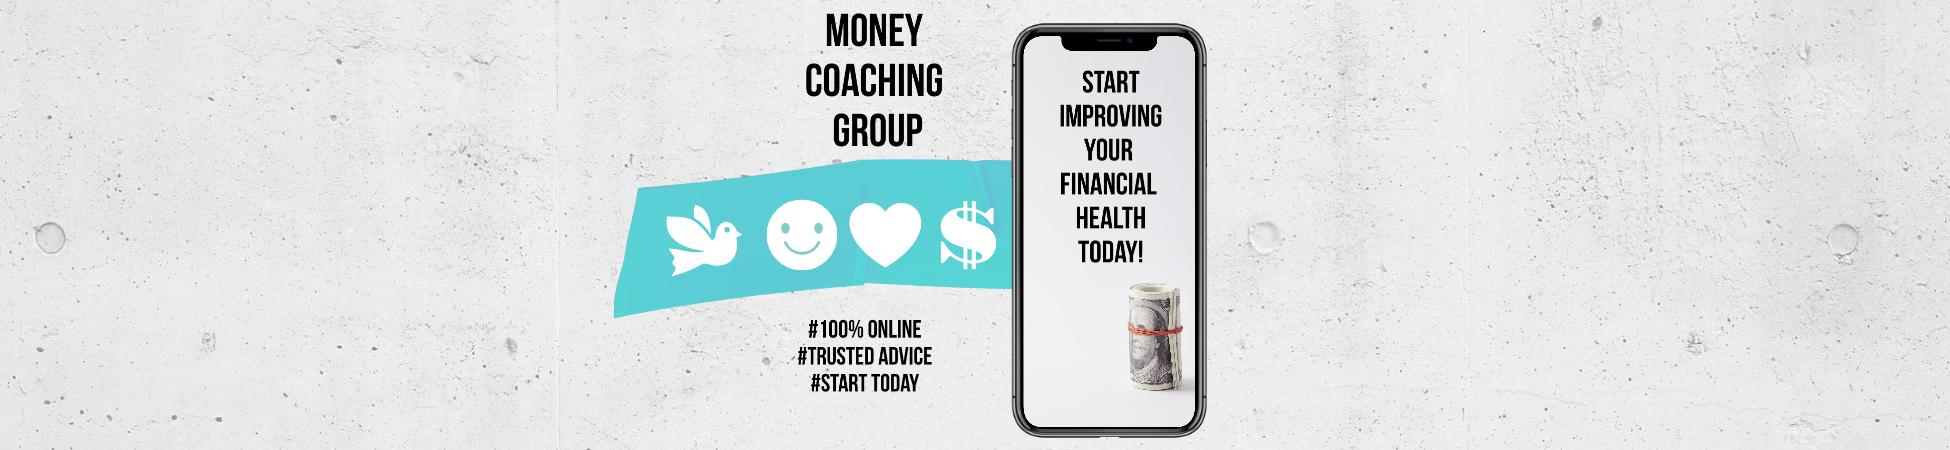 Money Coaching Group